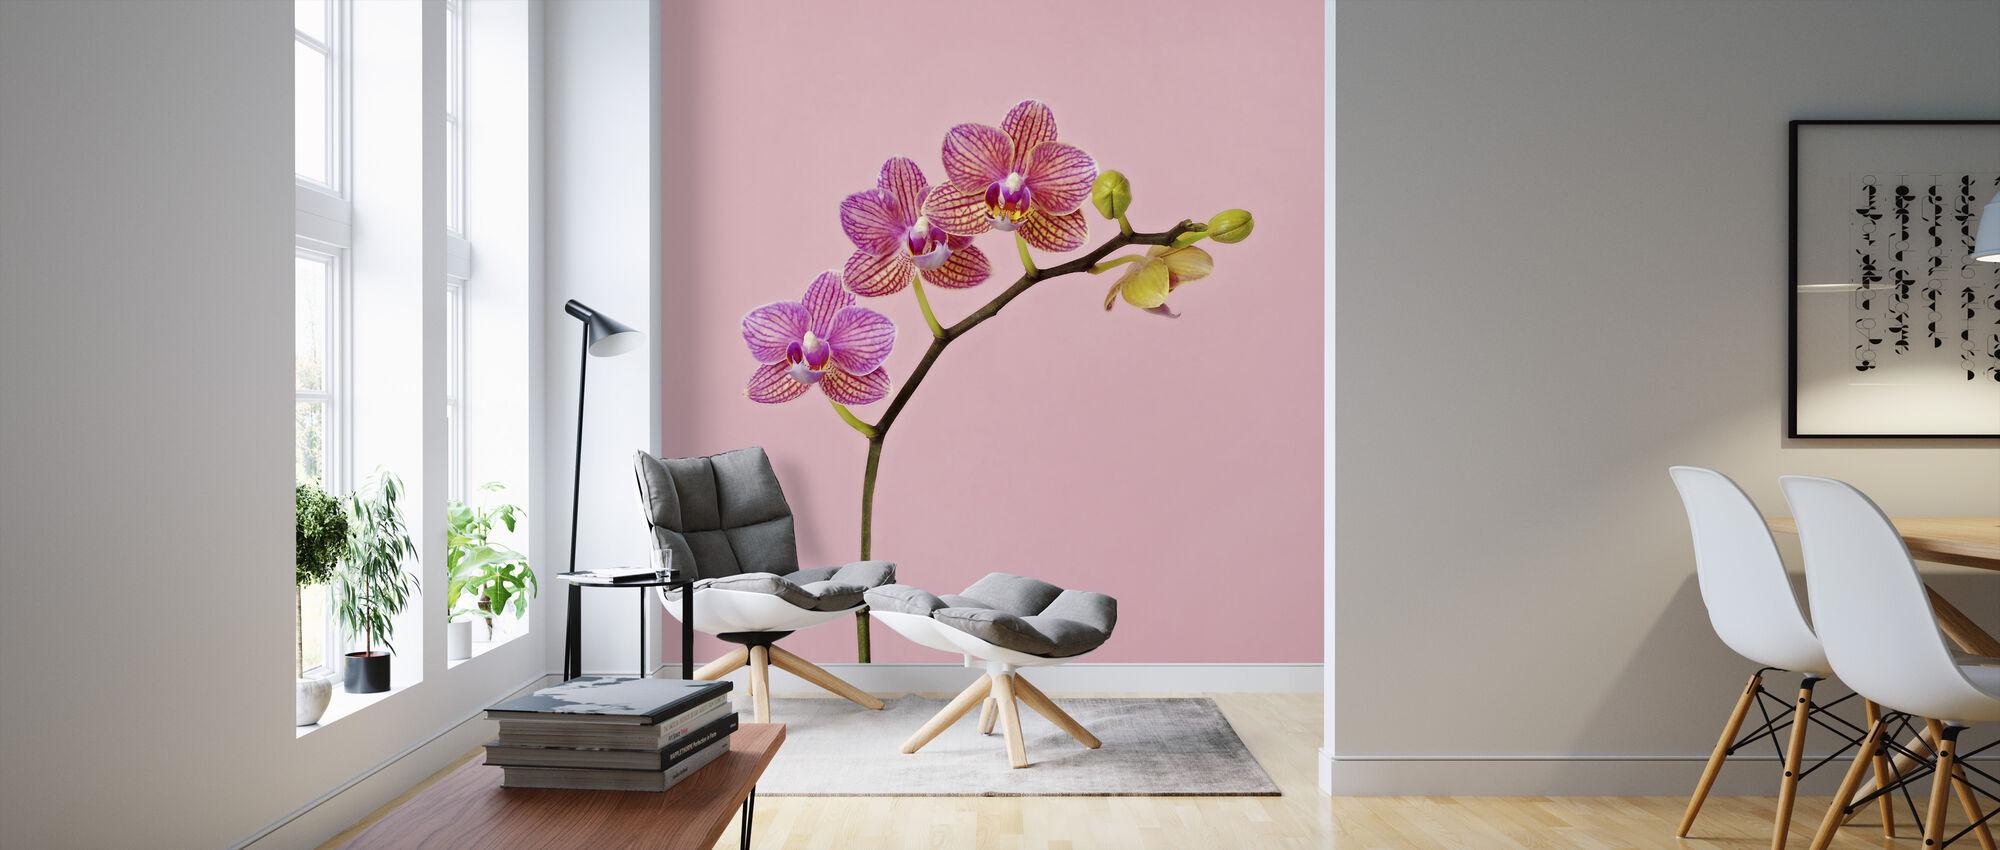 Rosa Orkide - Tapet - Stue